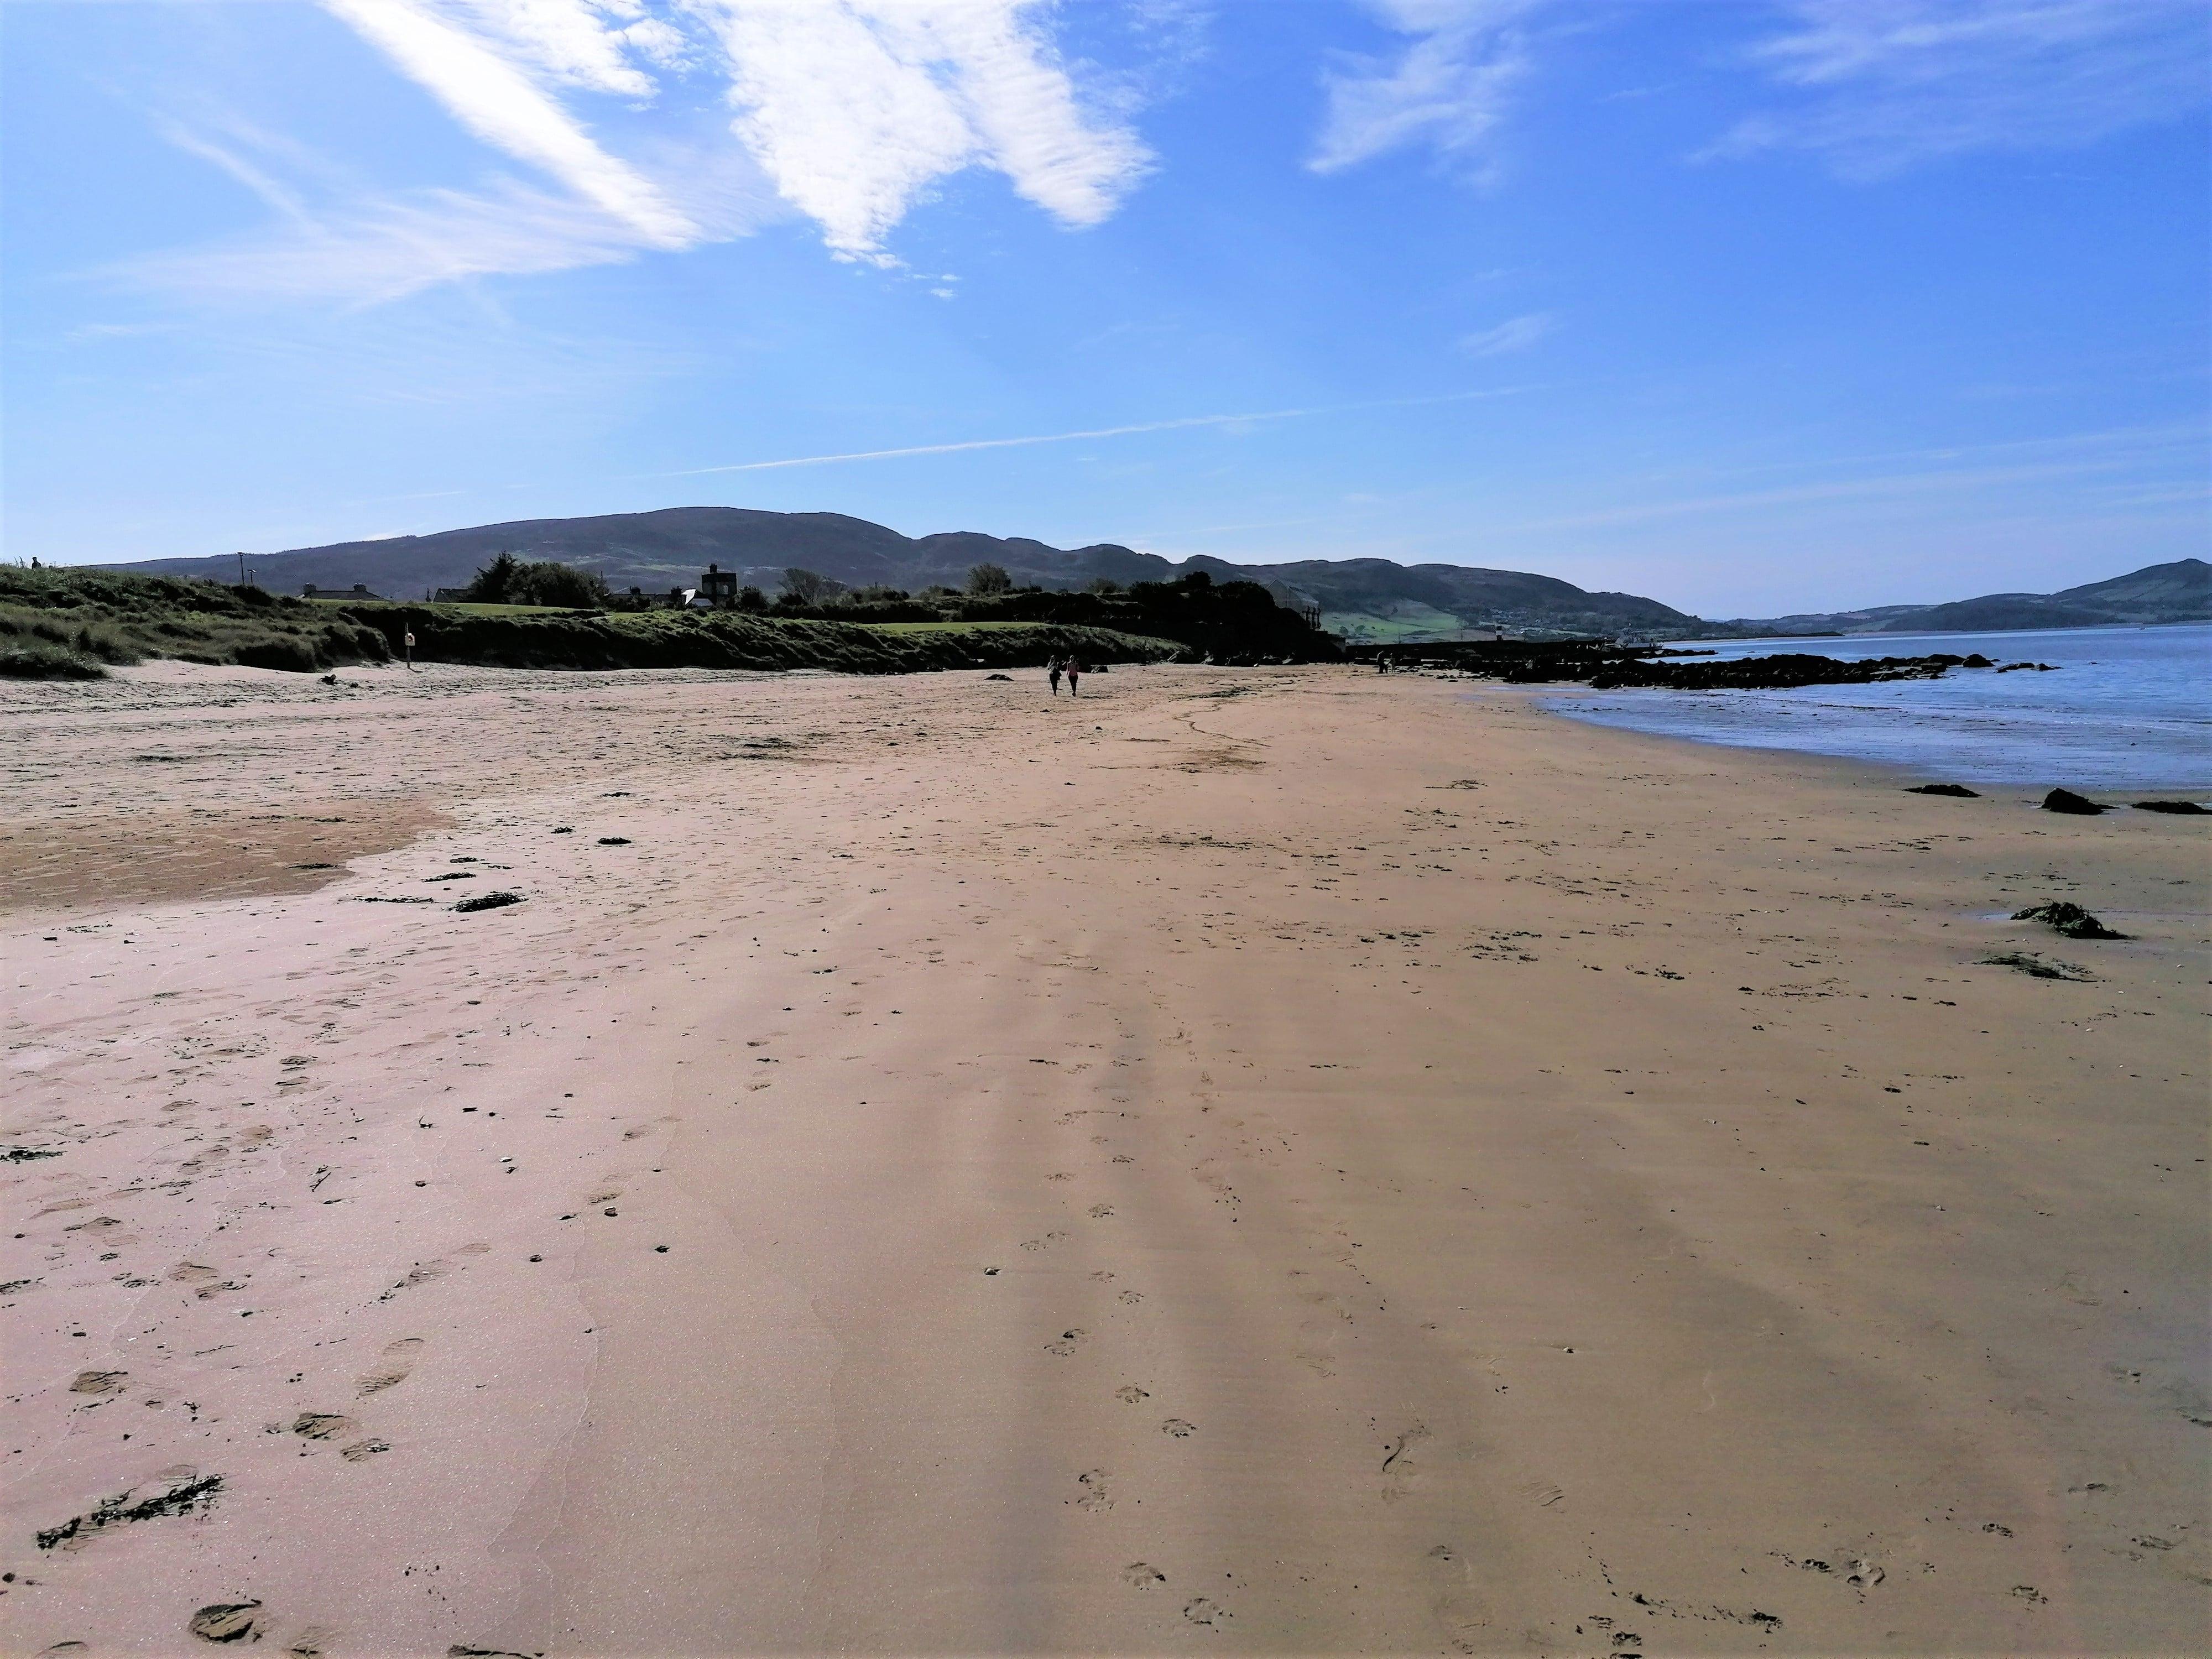 buncrana beach 11a min